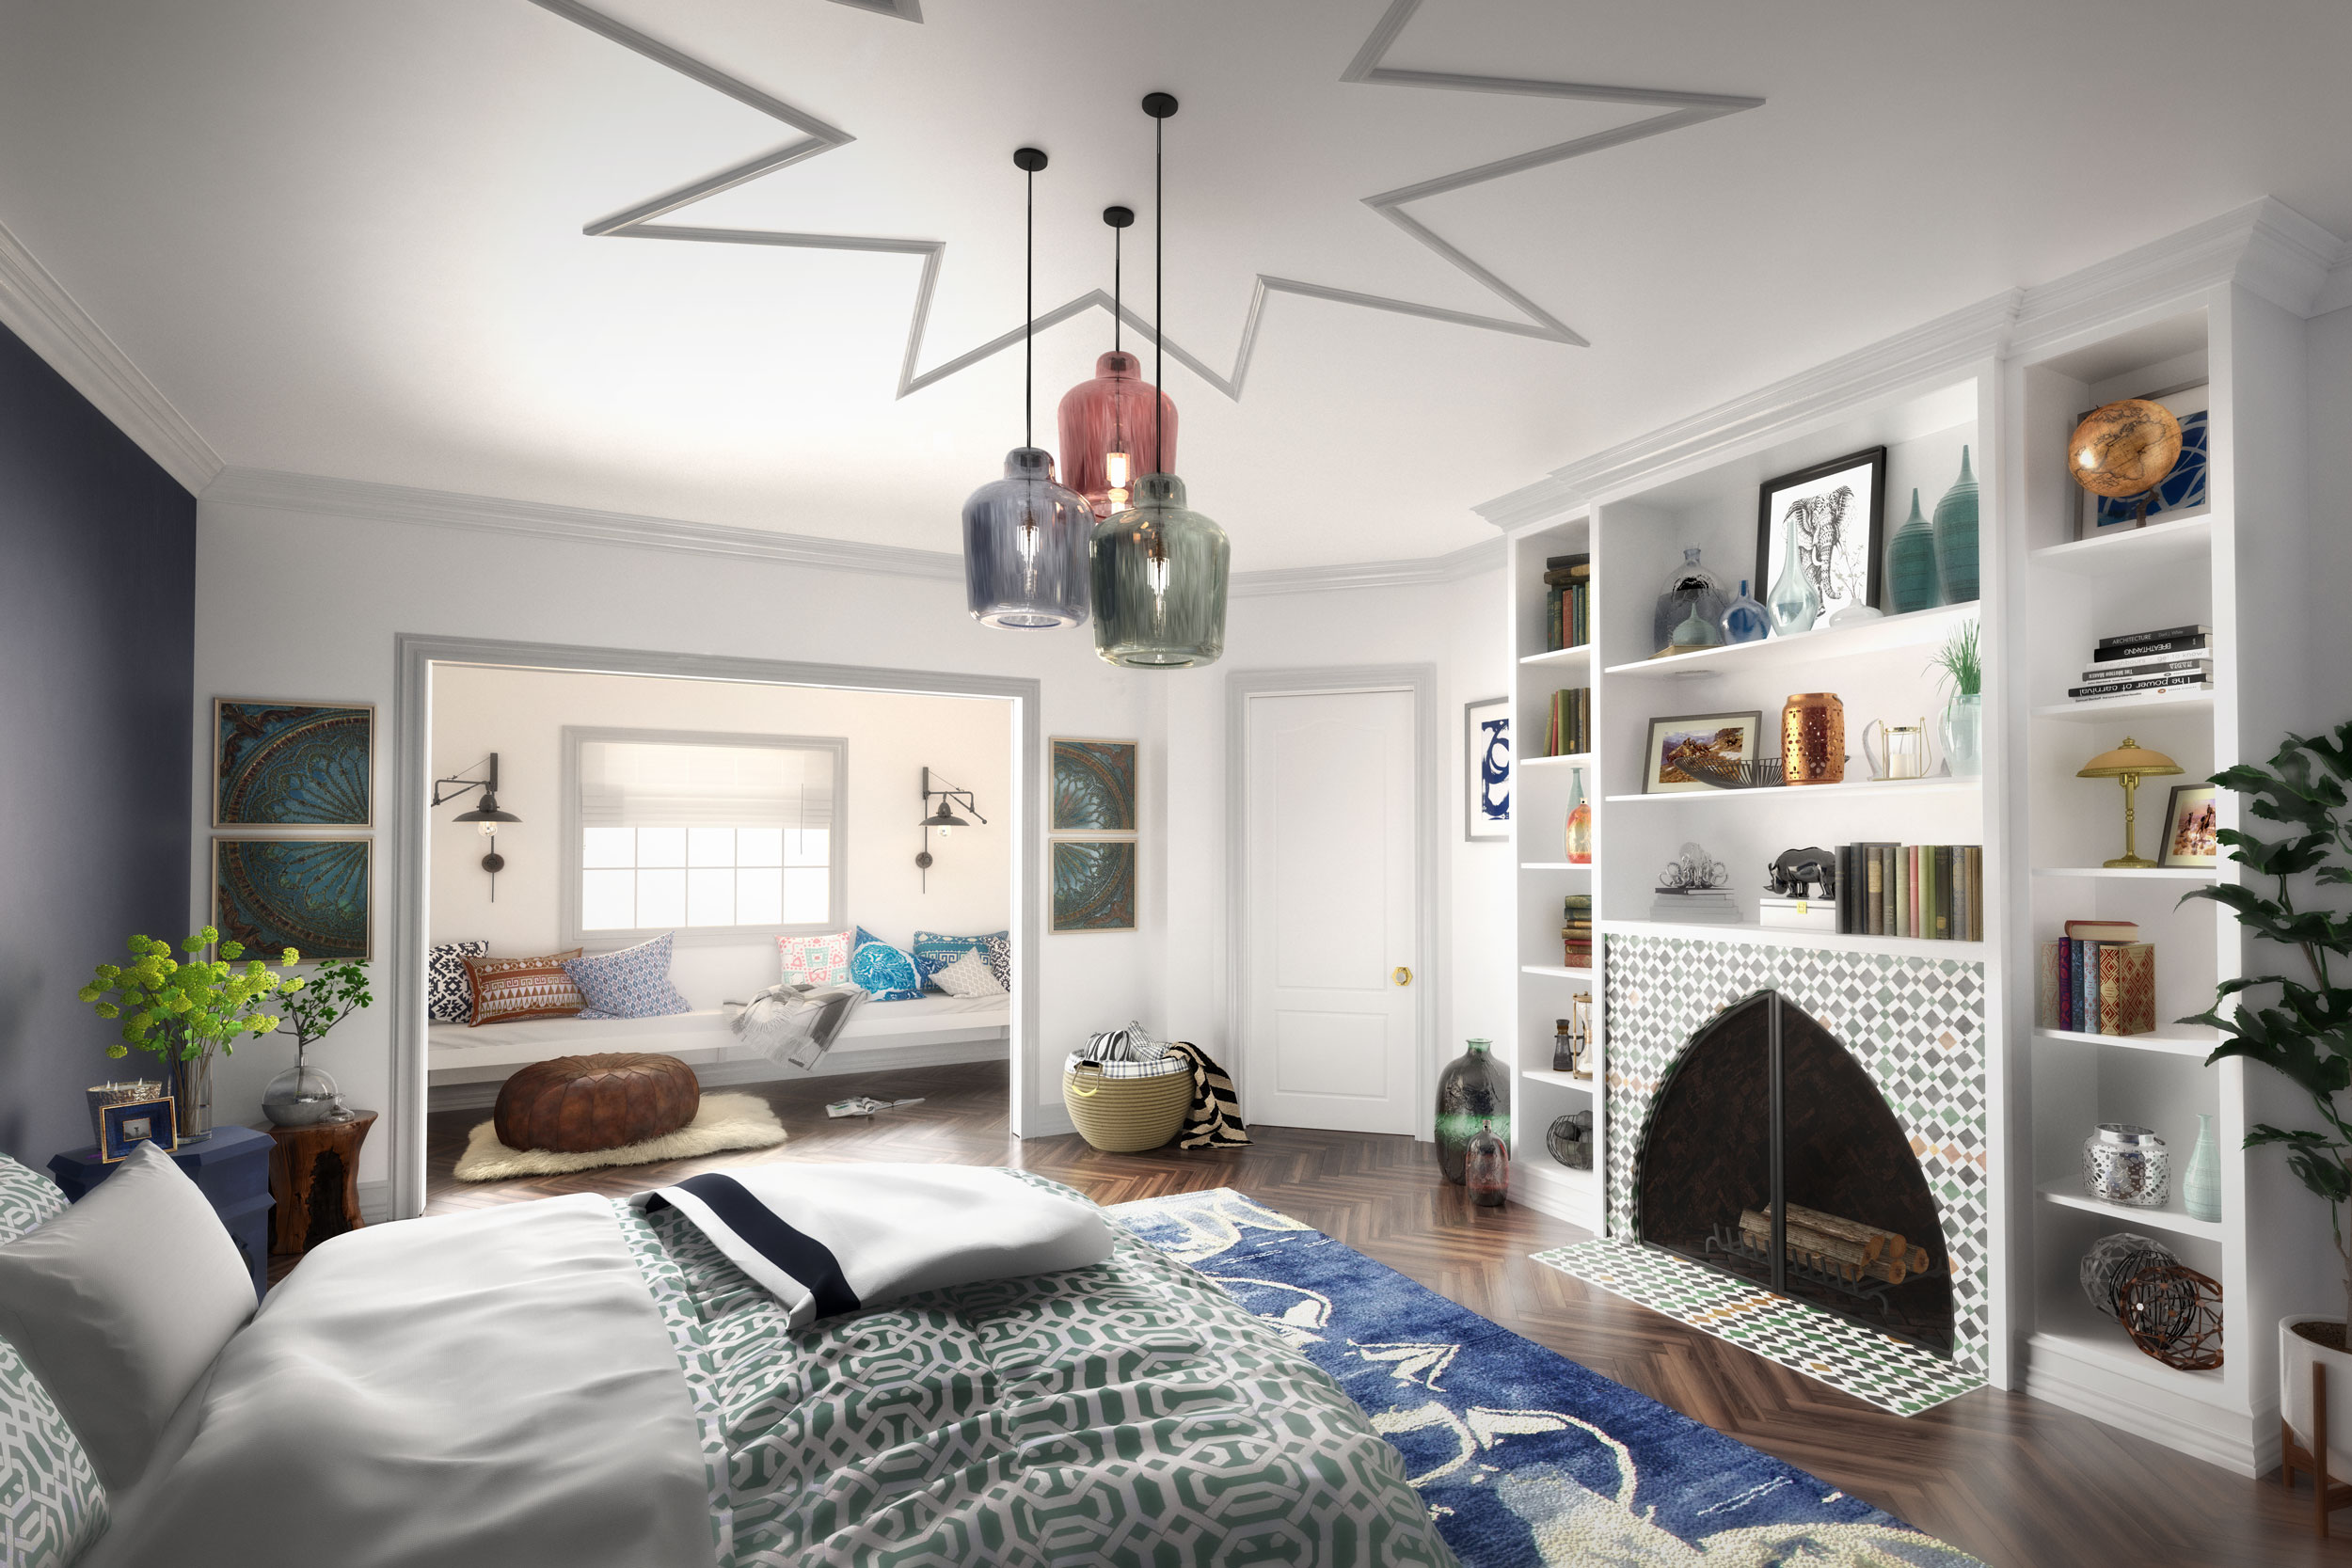 professional cgi photo of bedroom